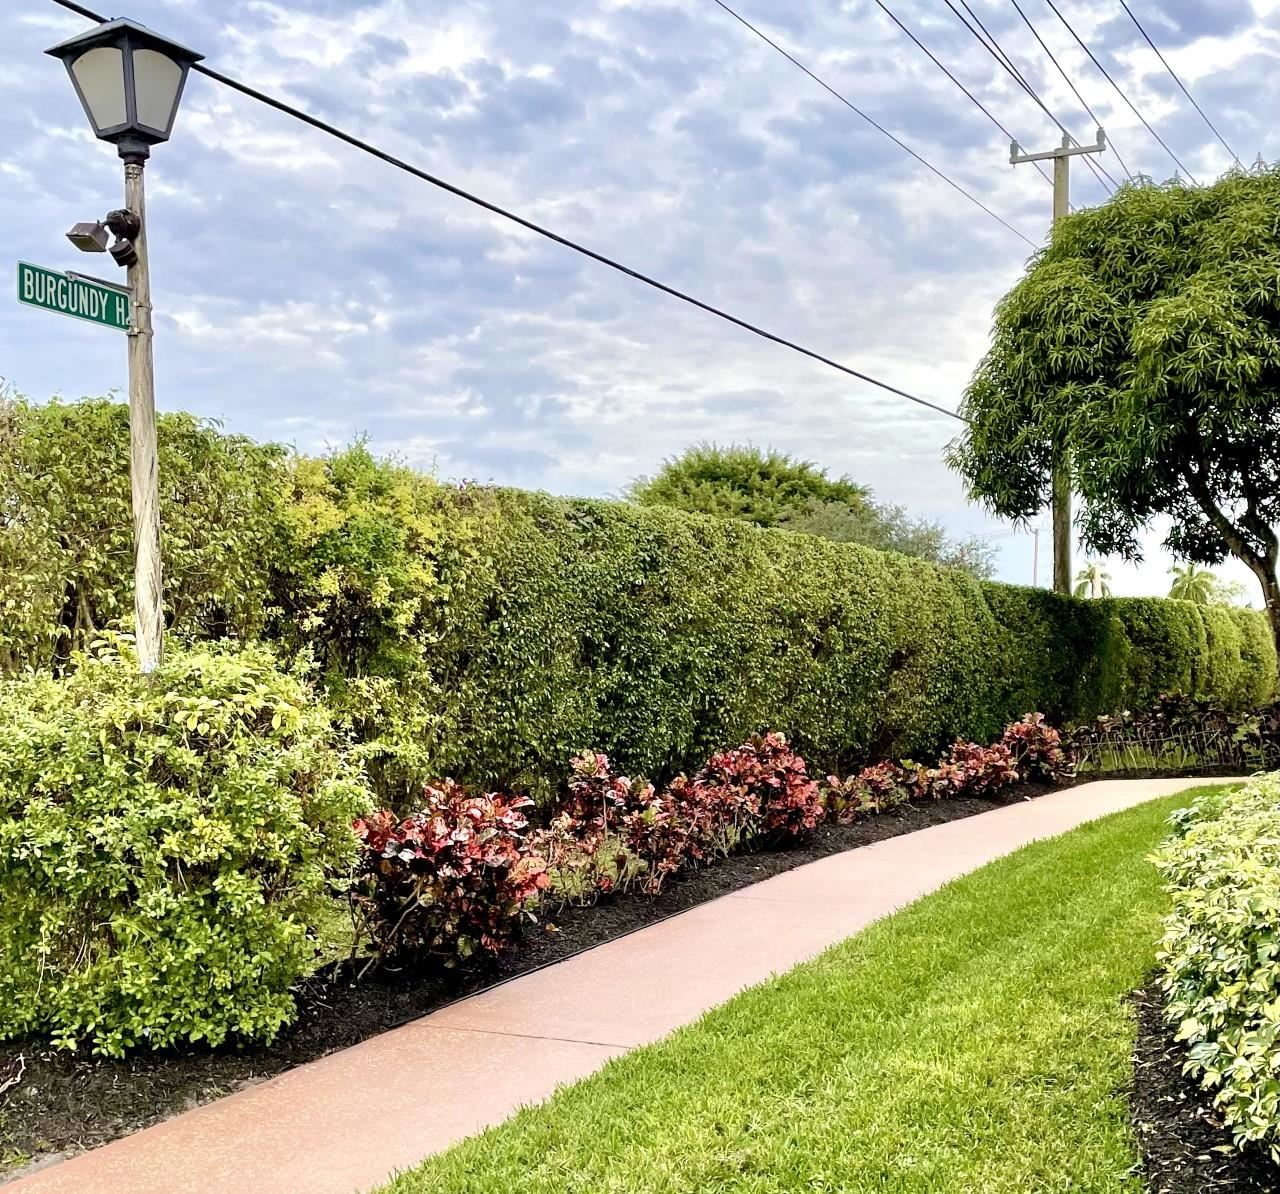 339 Burgundy H, Delray Beach, FL 33484 - MLS#: RX-10707367